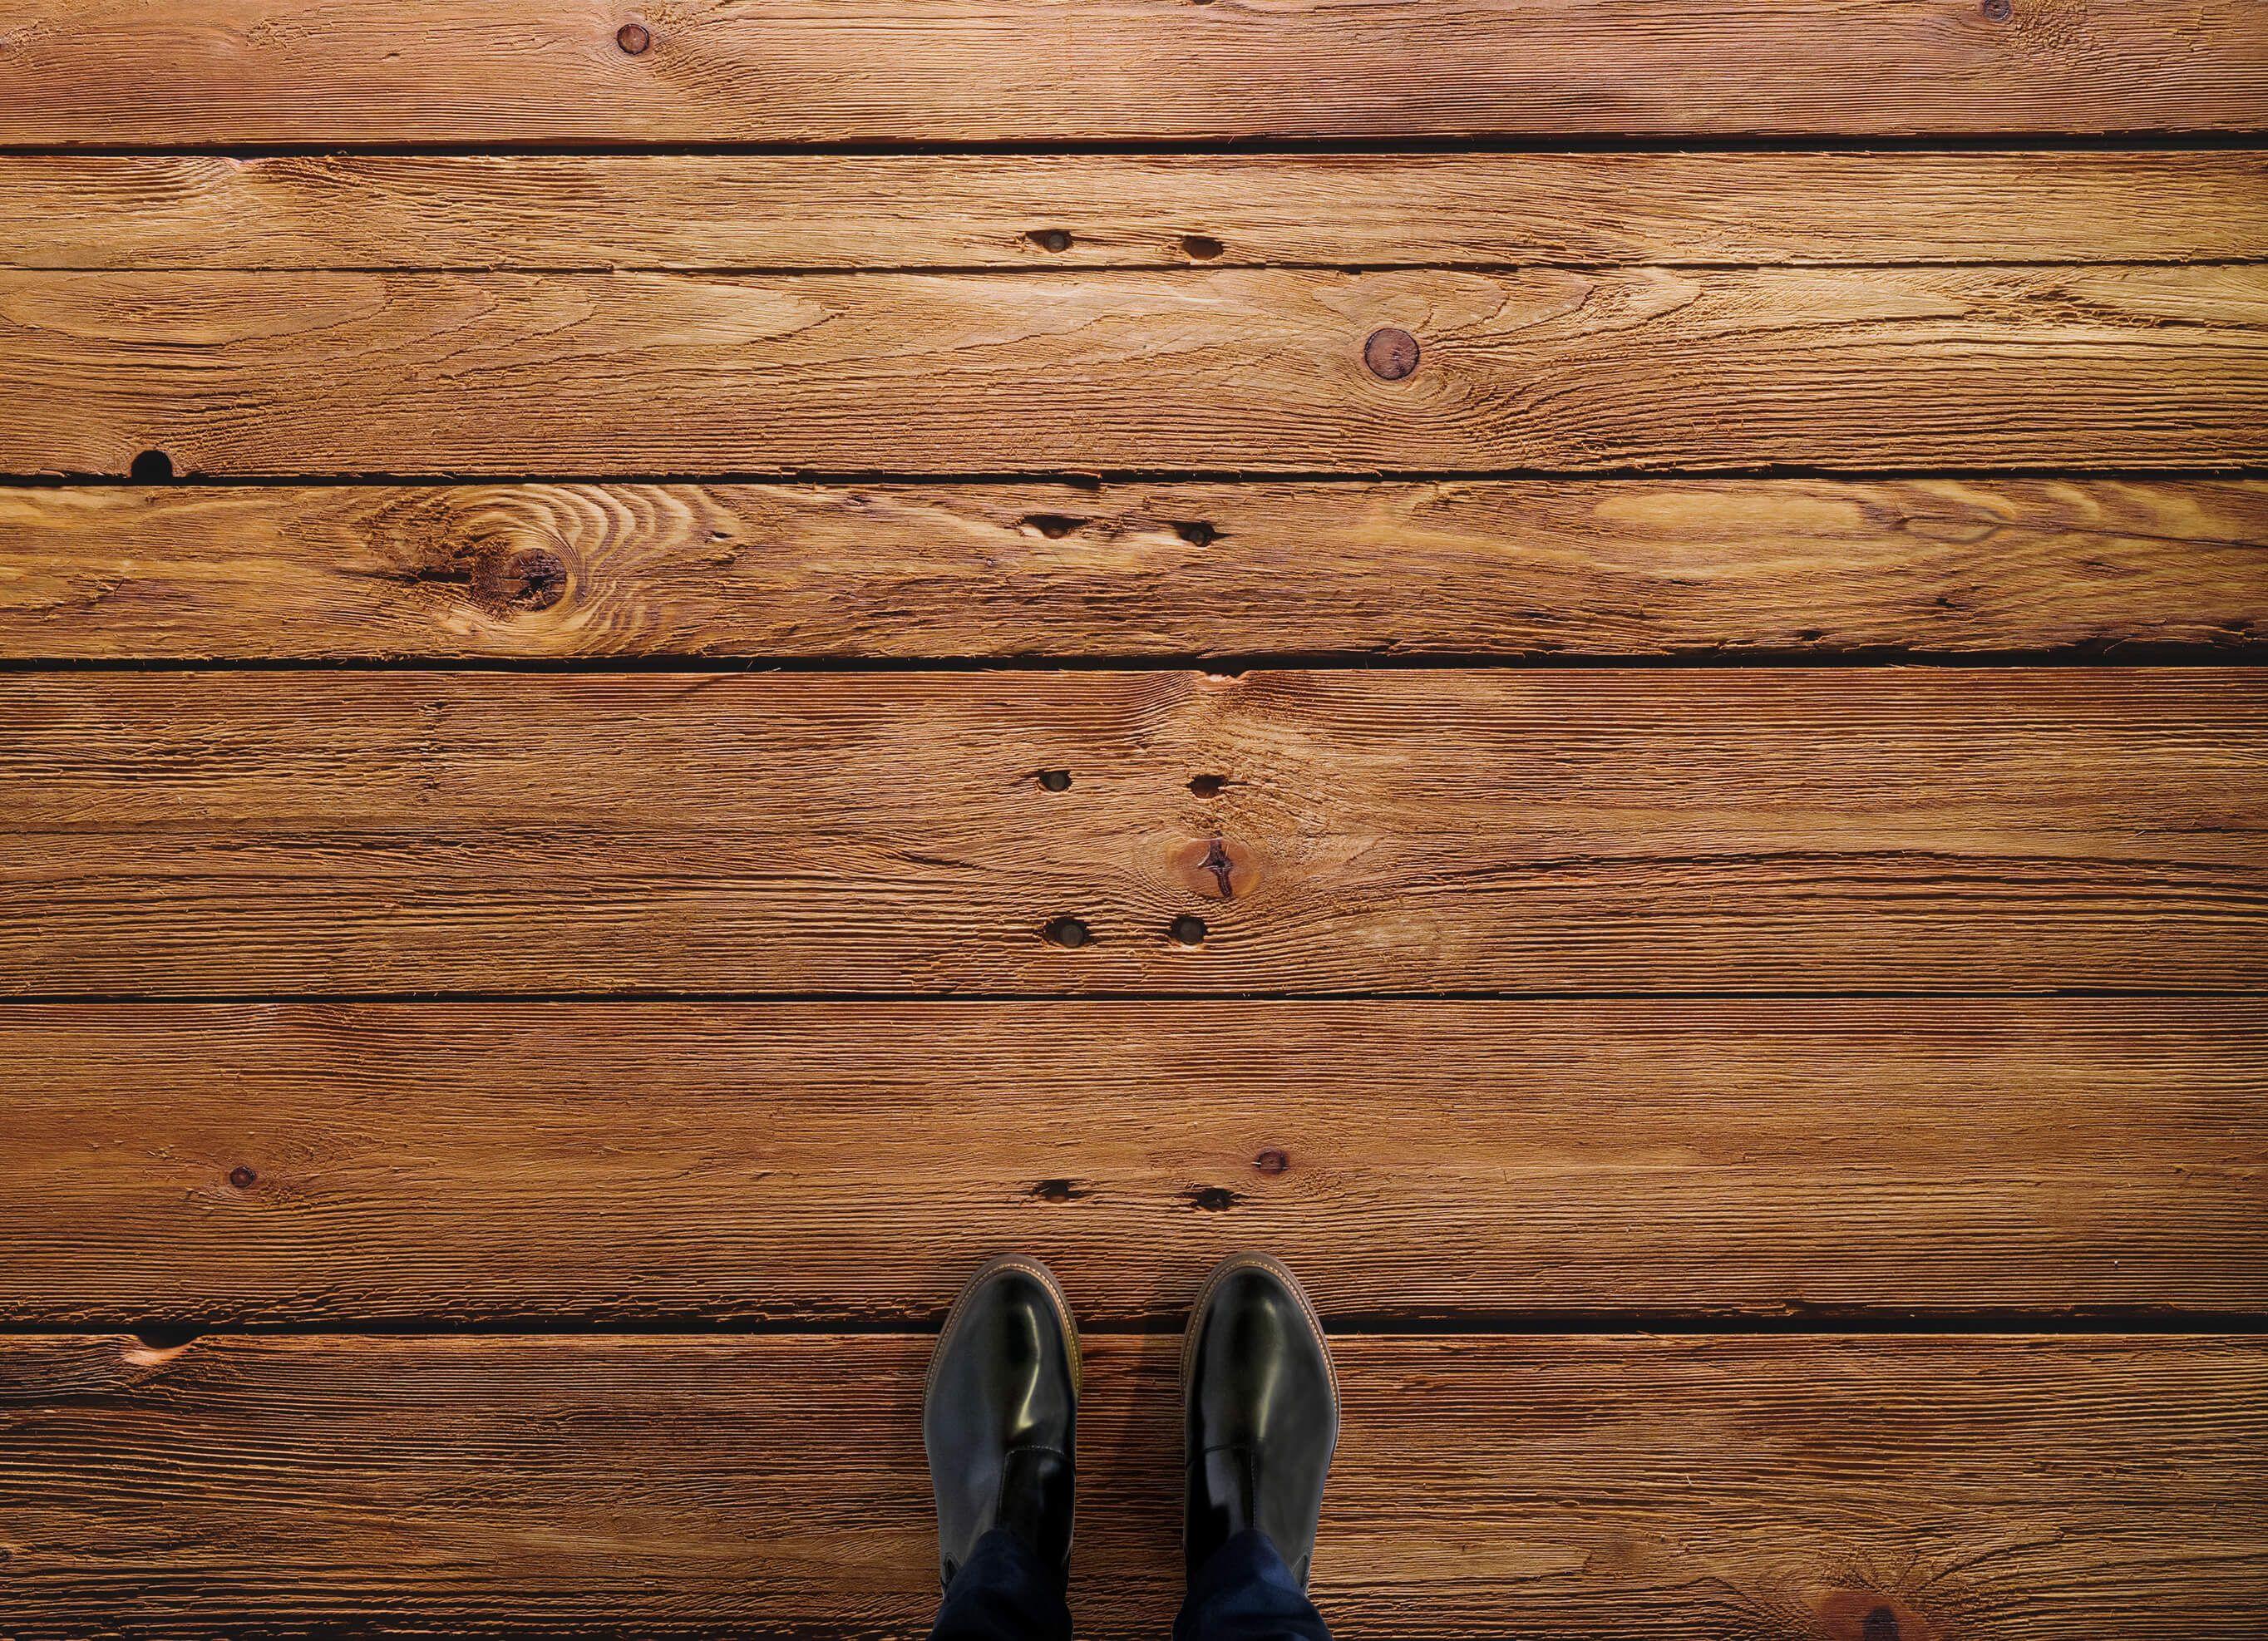 Wooden Plank Vinyl Flooring Brown Wood Texture Wood Wallpaper Wood Texture